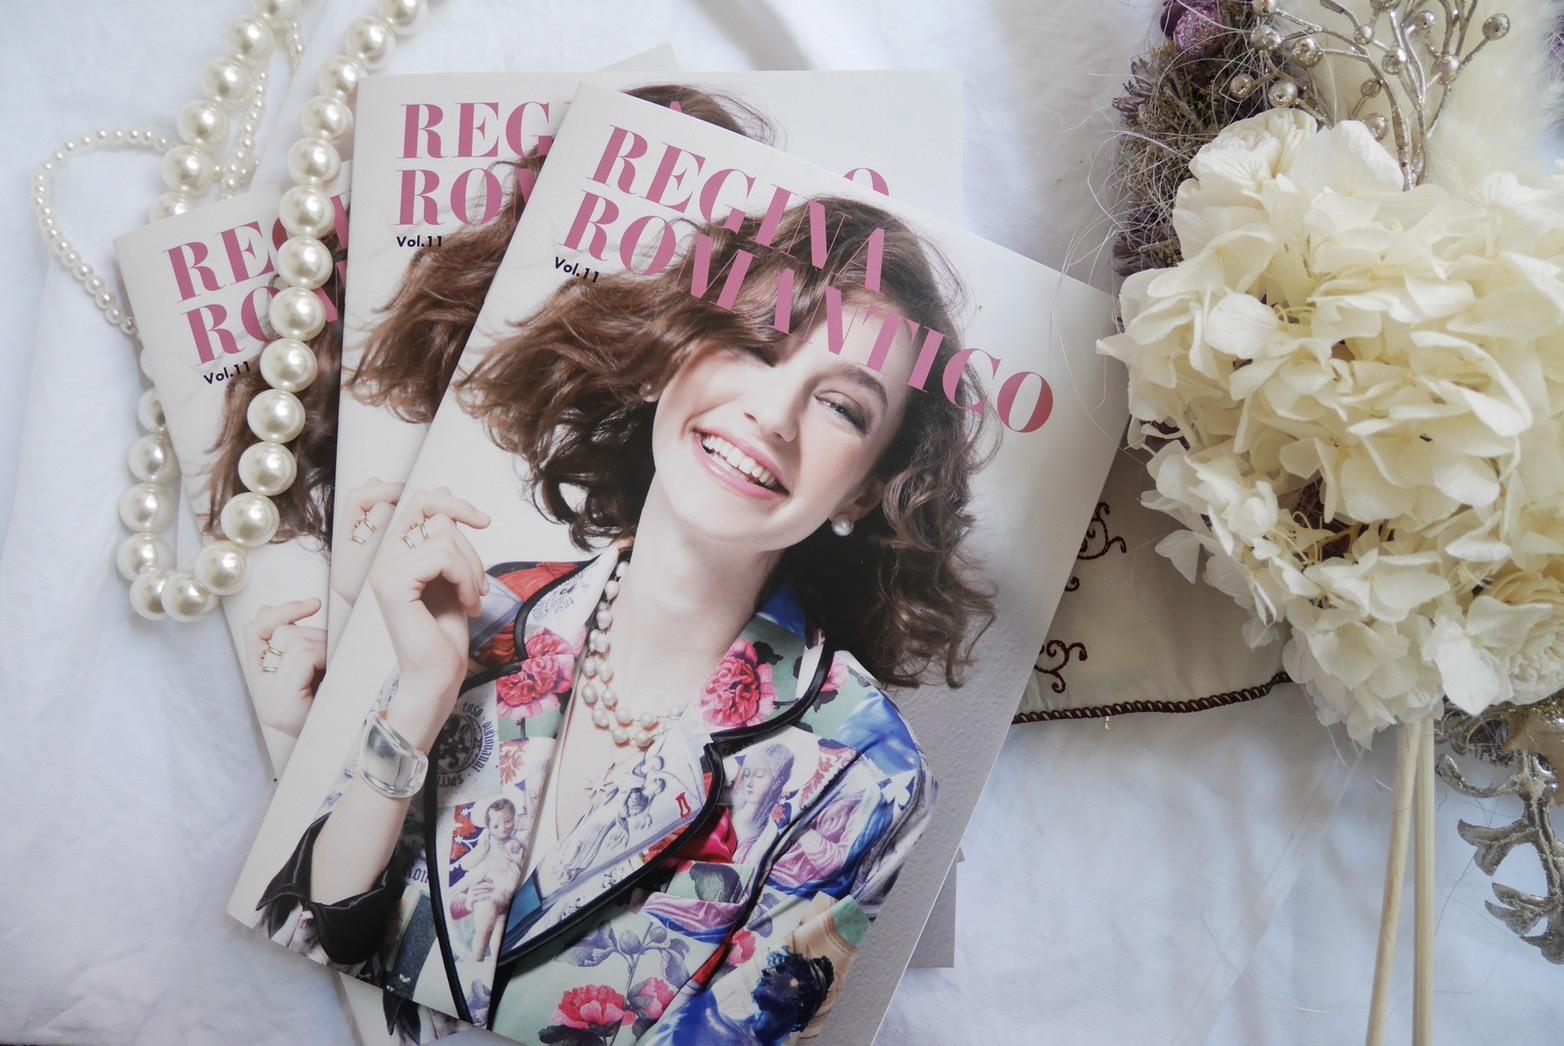 REGINA ROMANTICO大阪店より愛を込めて_a0149478_23555867.jpeg